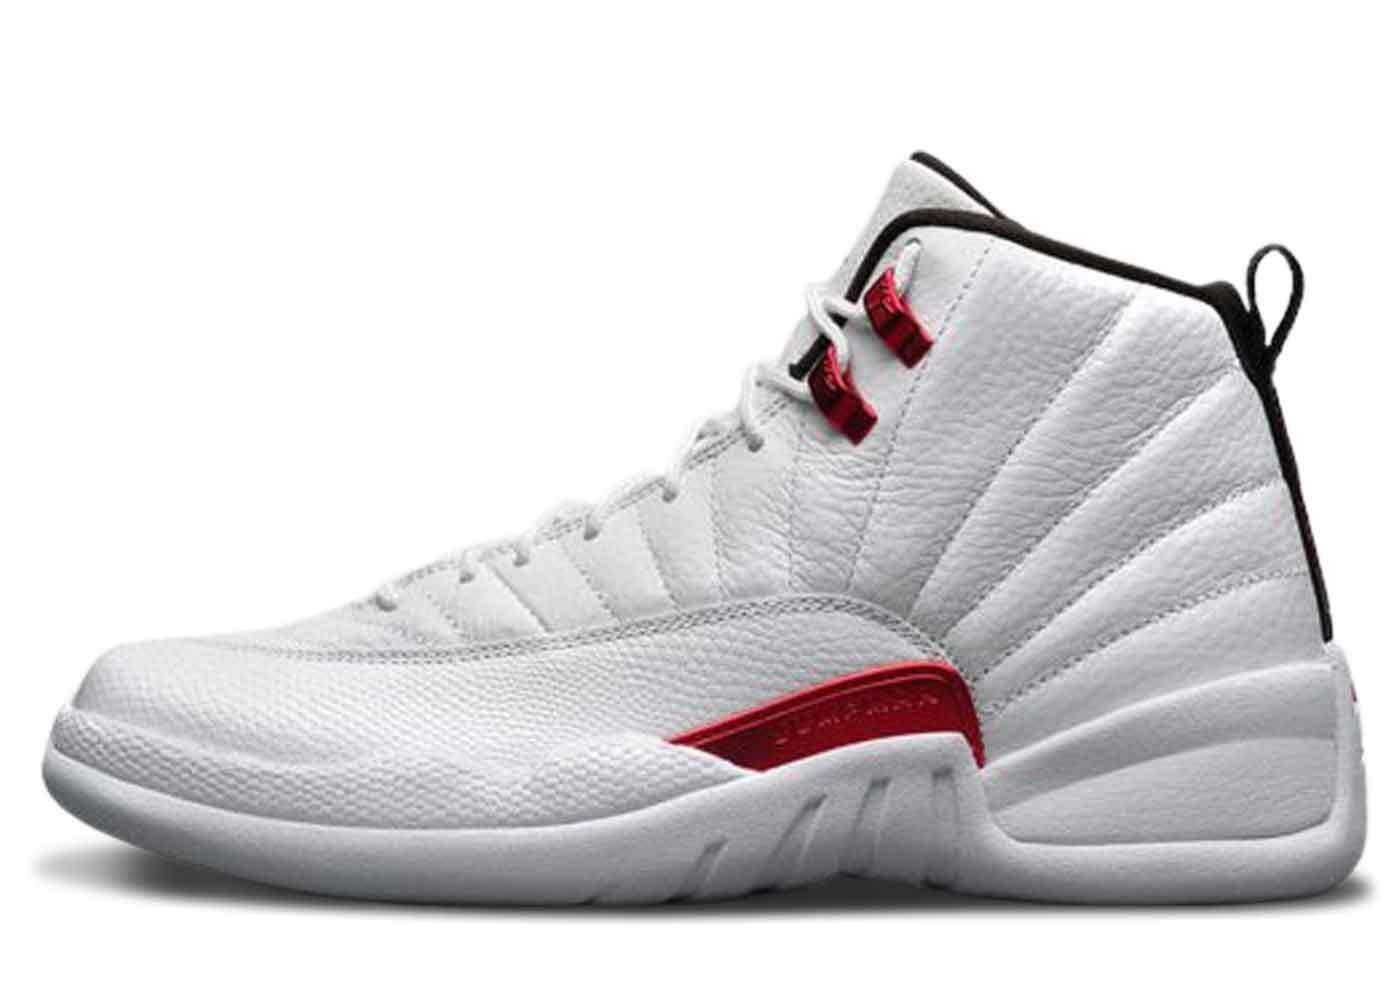 Nike Air Jordan 12 Twistの写真